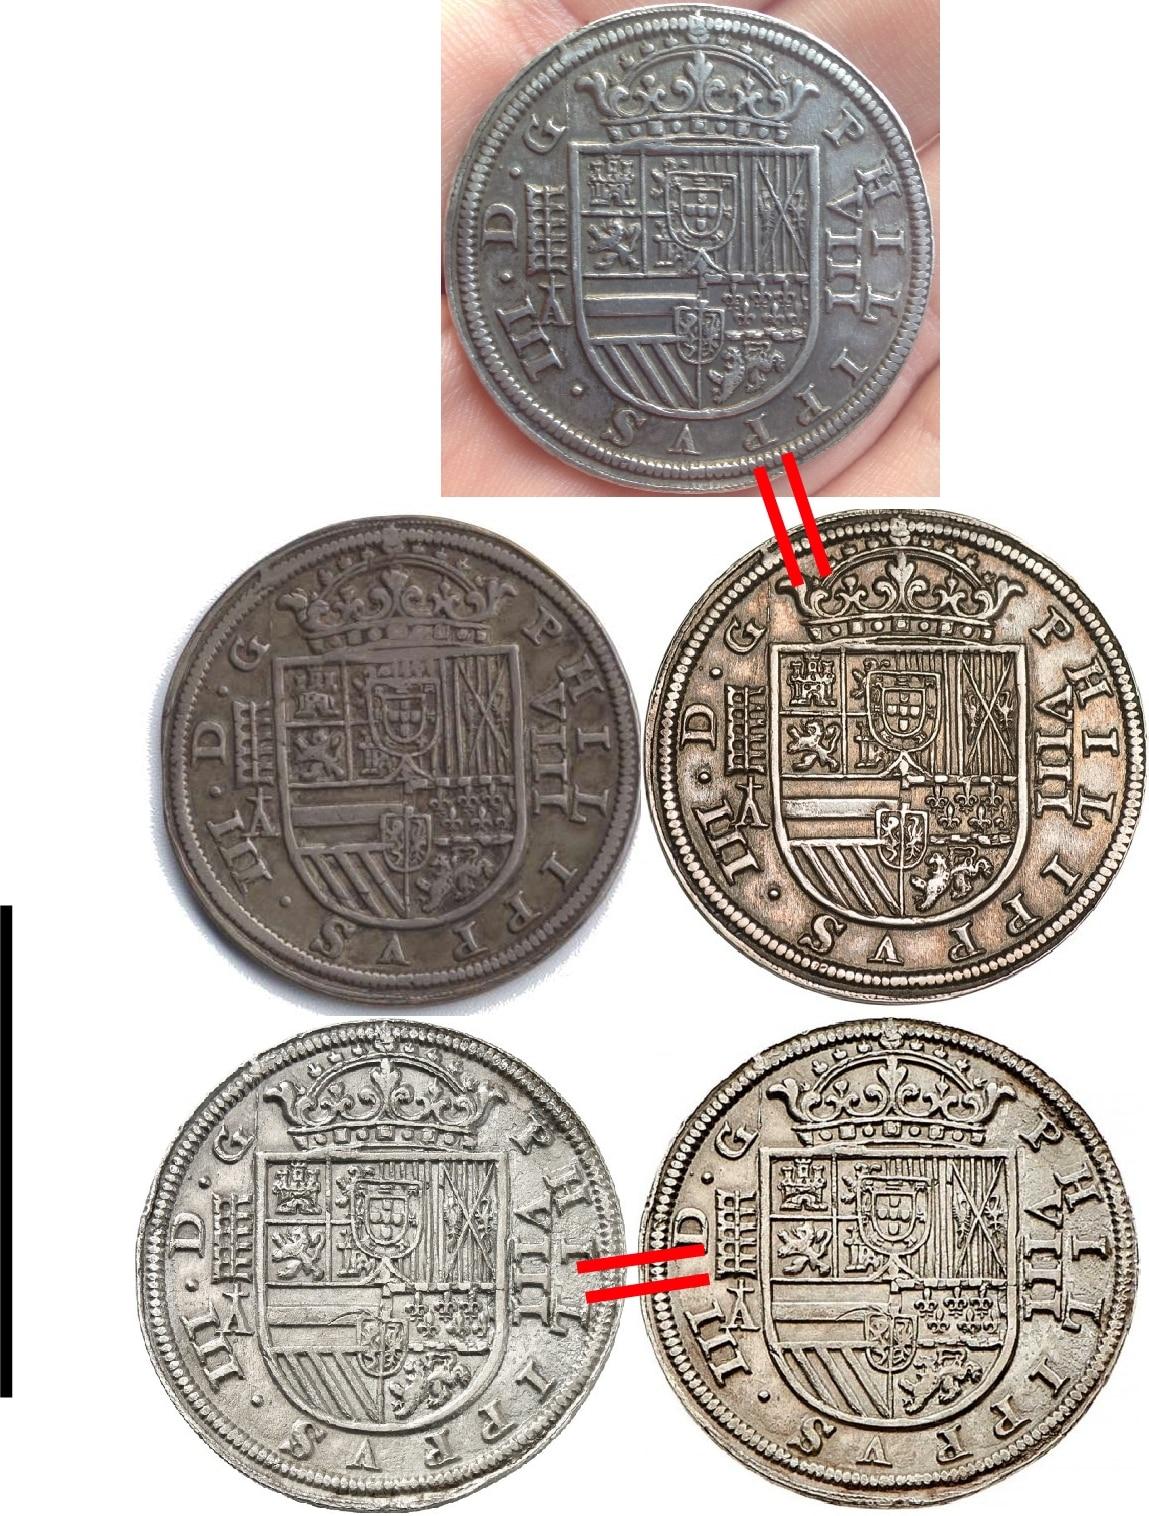 8 reales de 1617, Felipe III, Segovia  Anversos